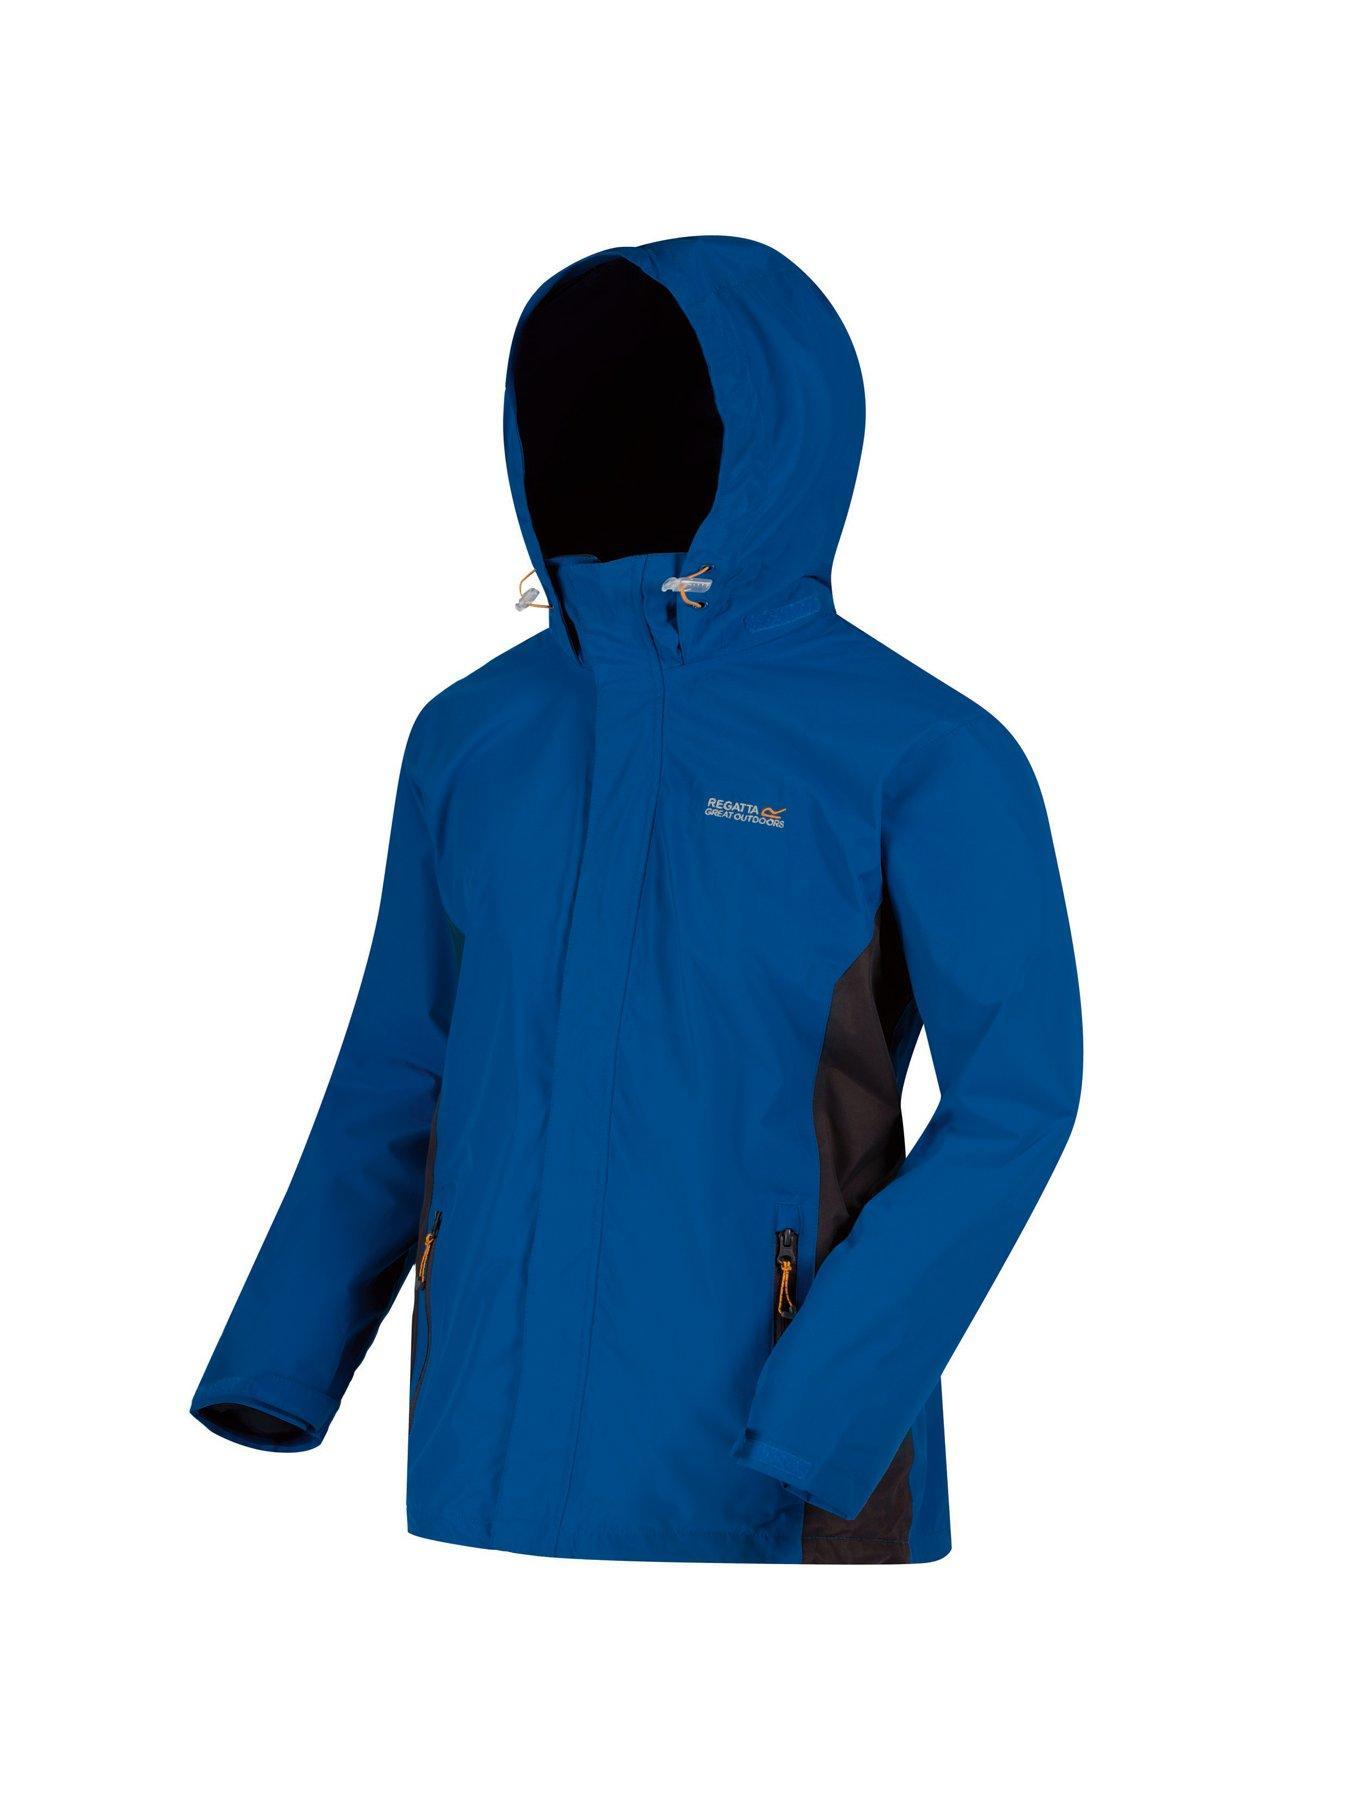 Regatta Mens Matt Waterproof Durable Hydrafort Jacket 53/% OFF RRP